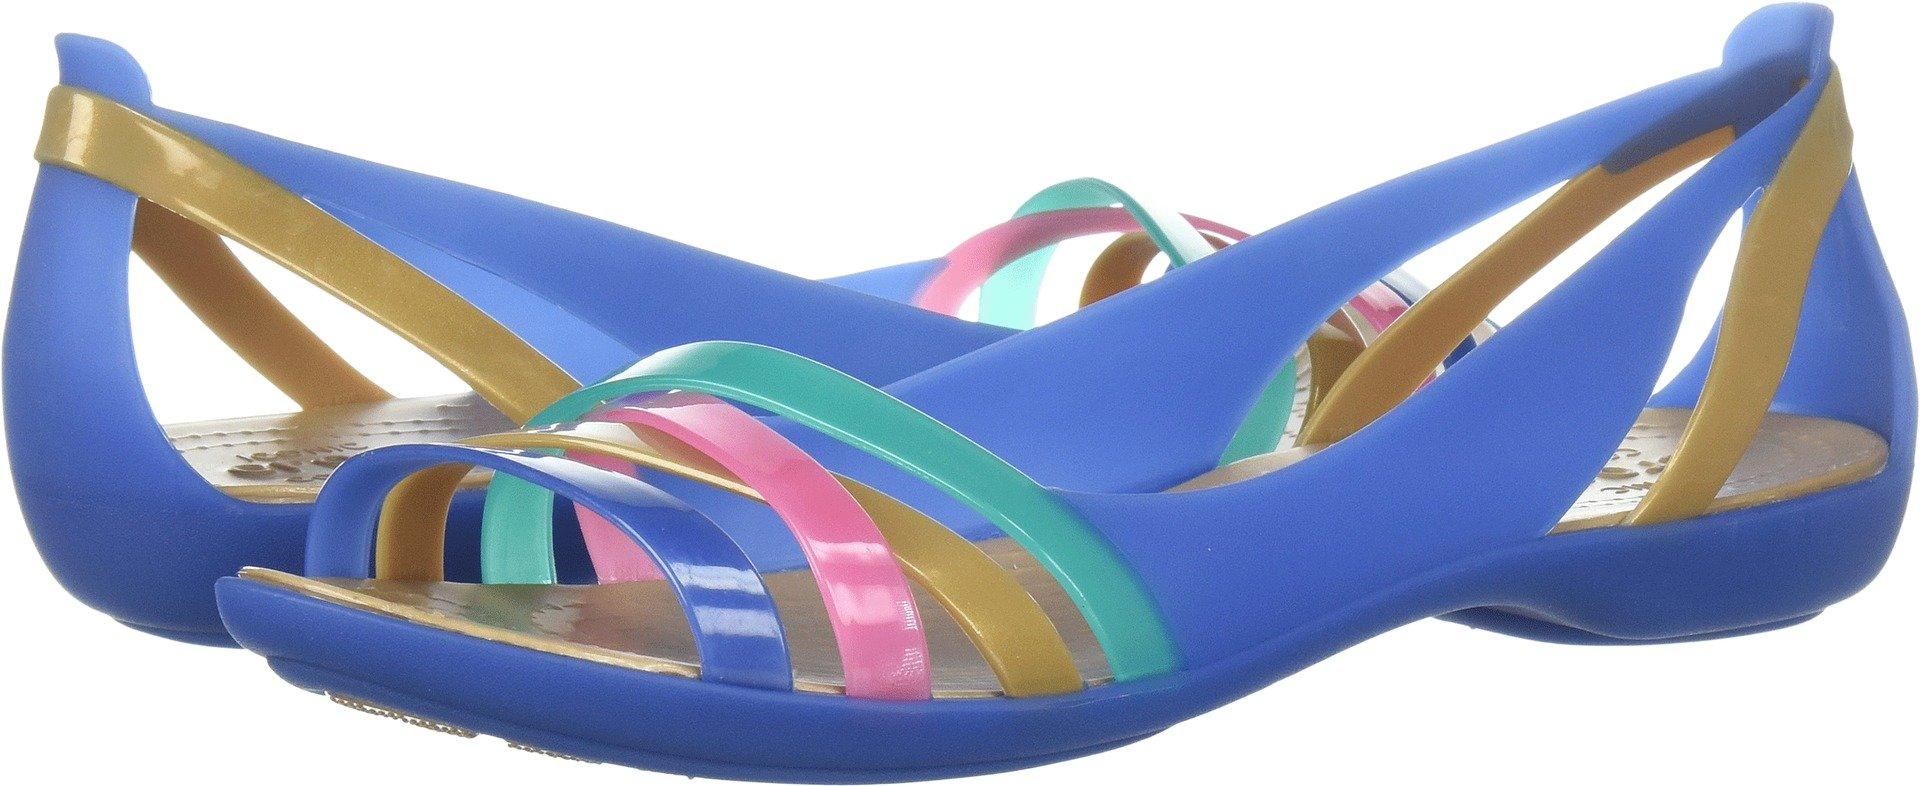 dd360f7ffcbf Crocs Women s Isabella Huarache 2 Flat W Sandal